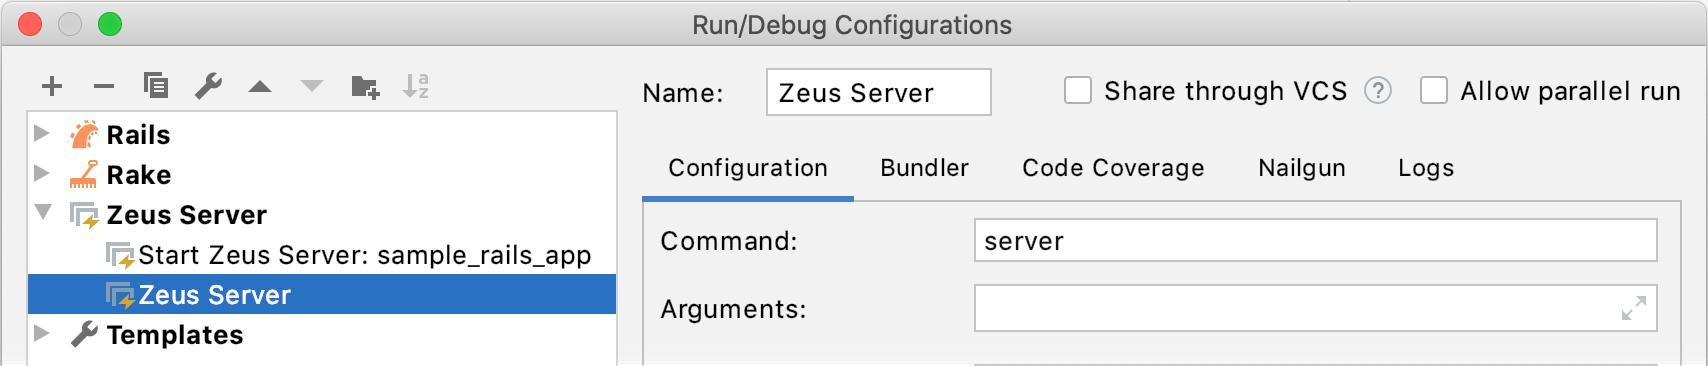 Run/Debug Configuration Zeus